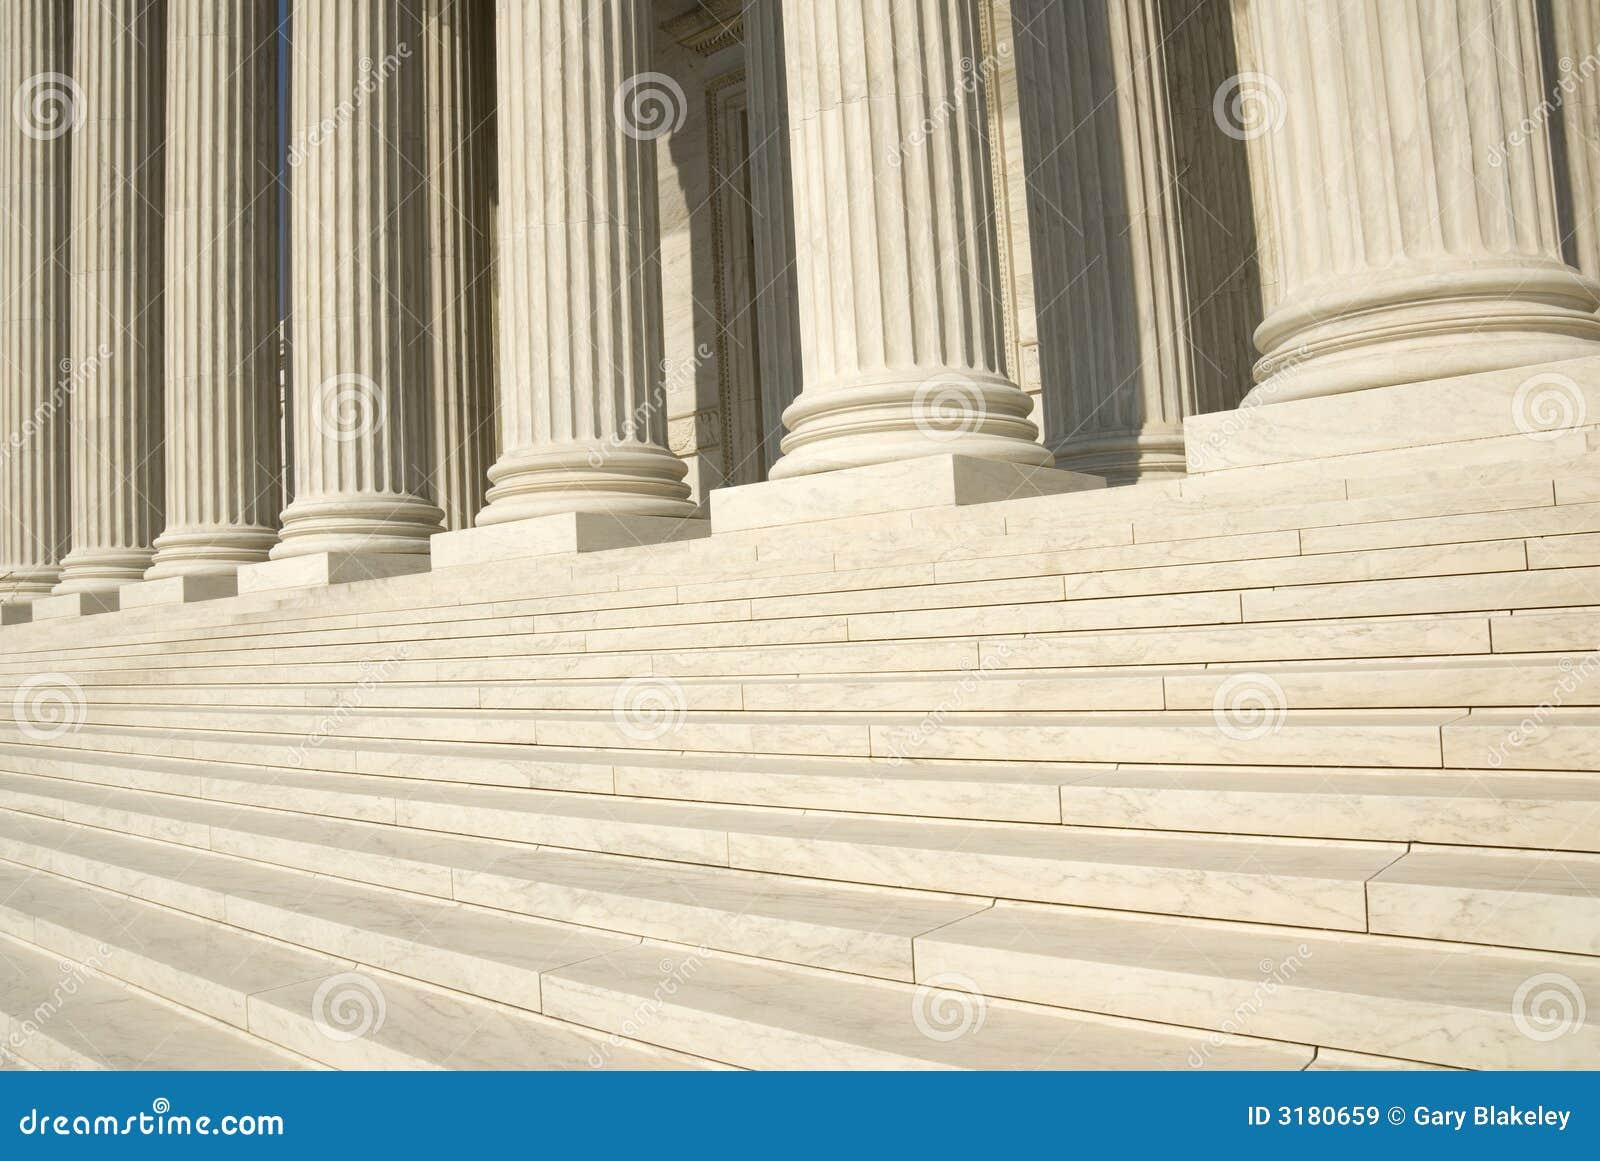 US Supreme Court - Steps